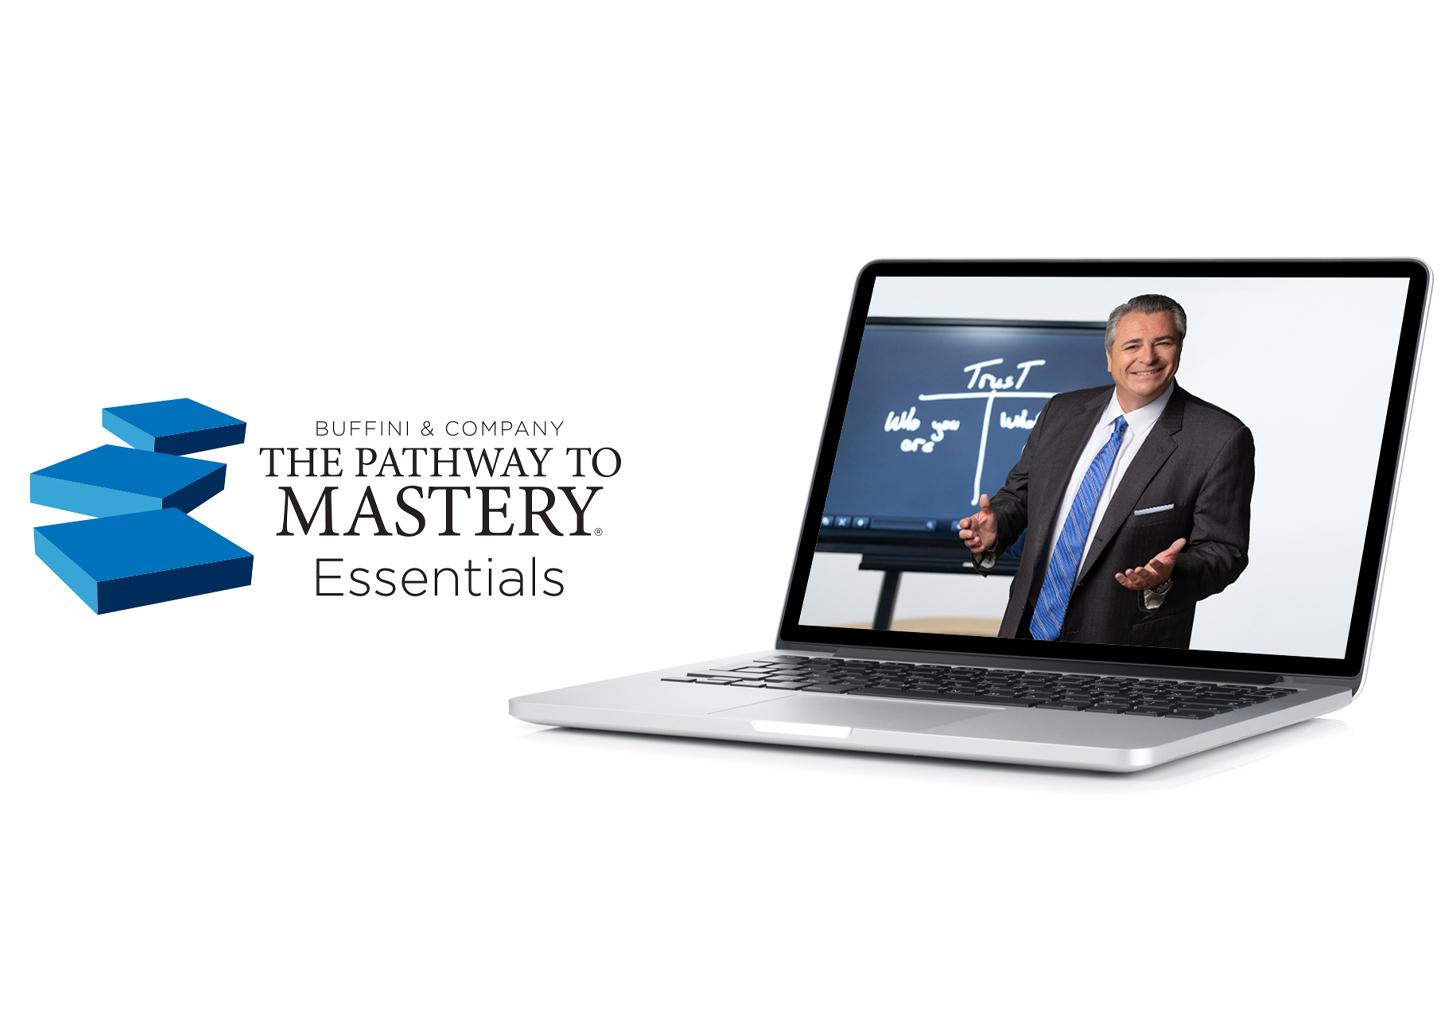 Digital Pathway to Mastery - Essentials